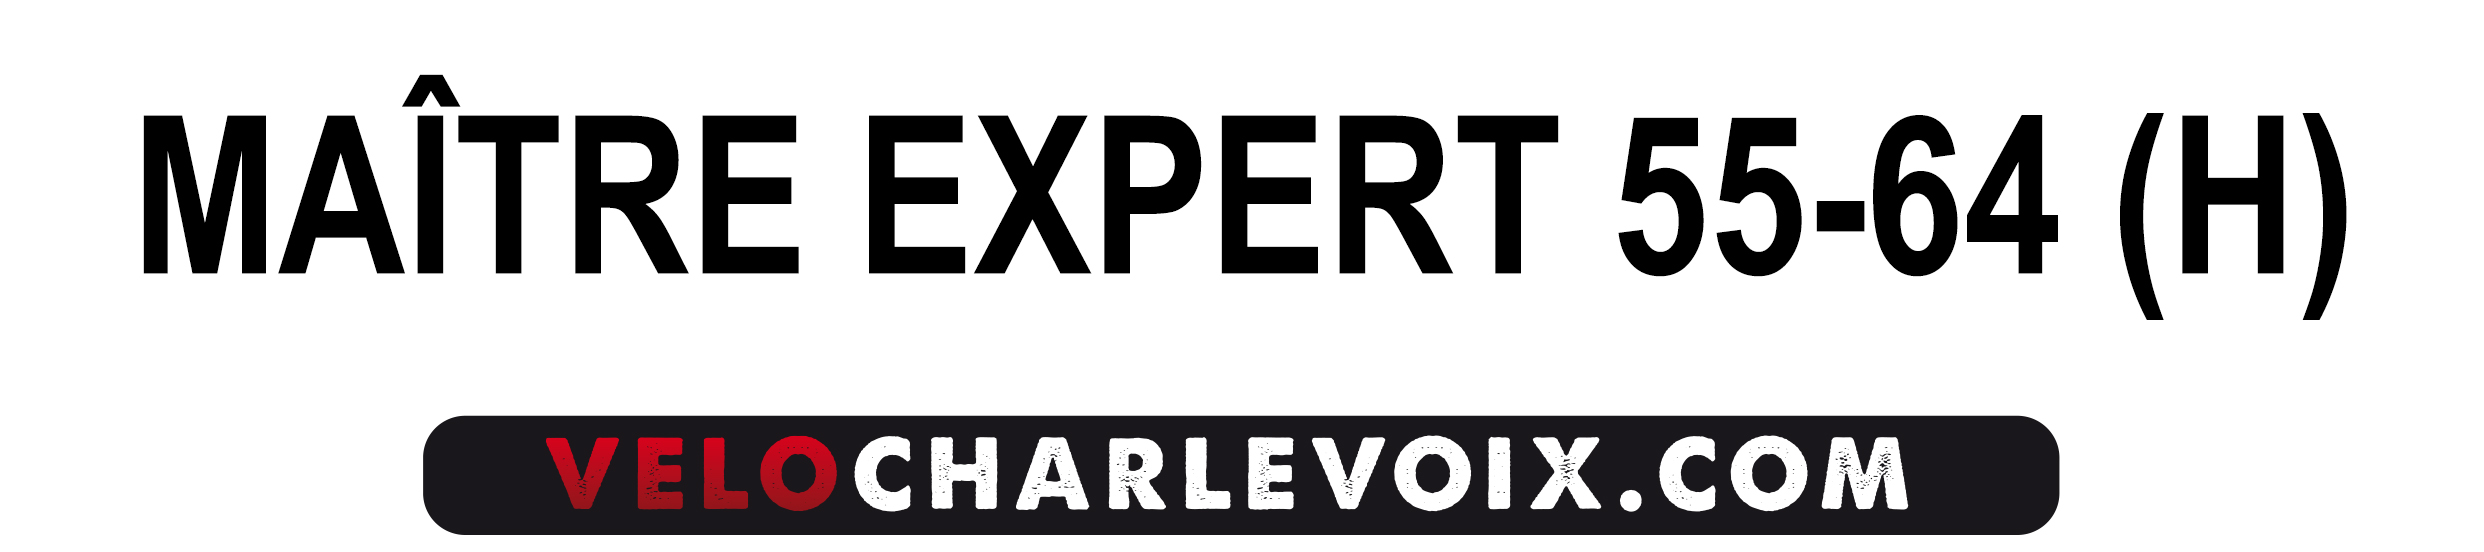 Categories Box Qc_Maitre expert 55-64 H